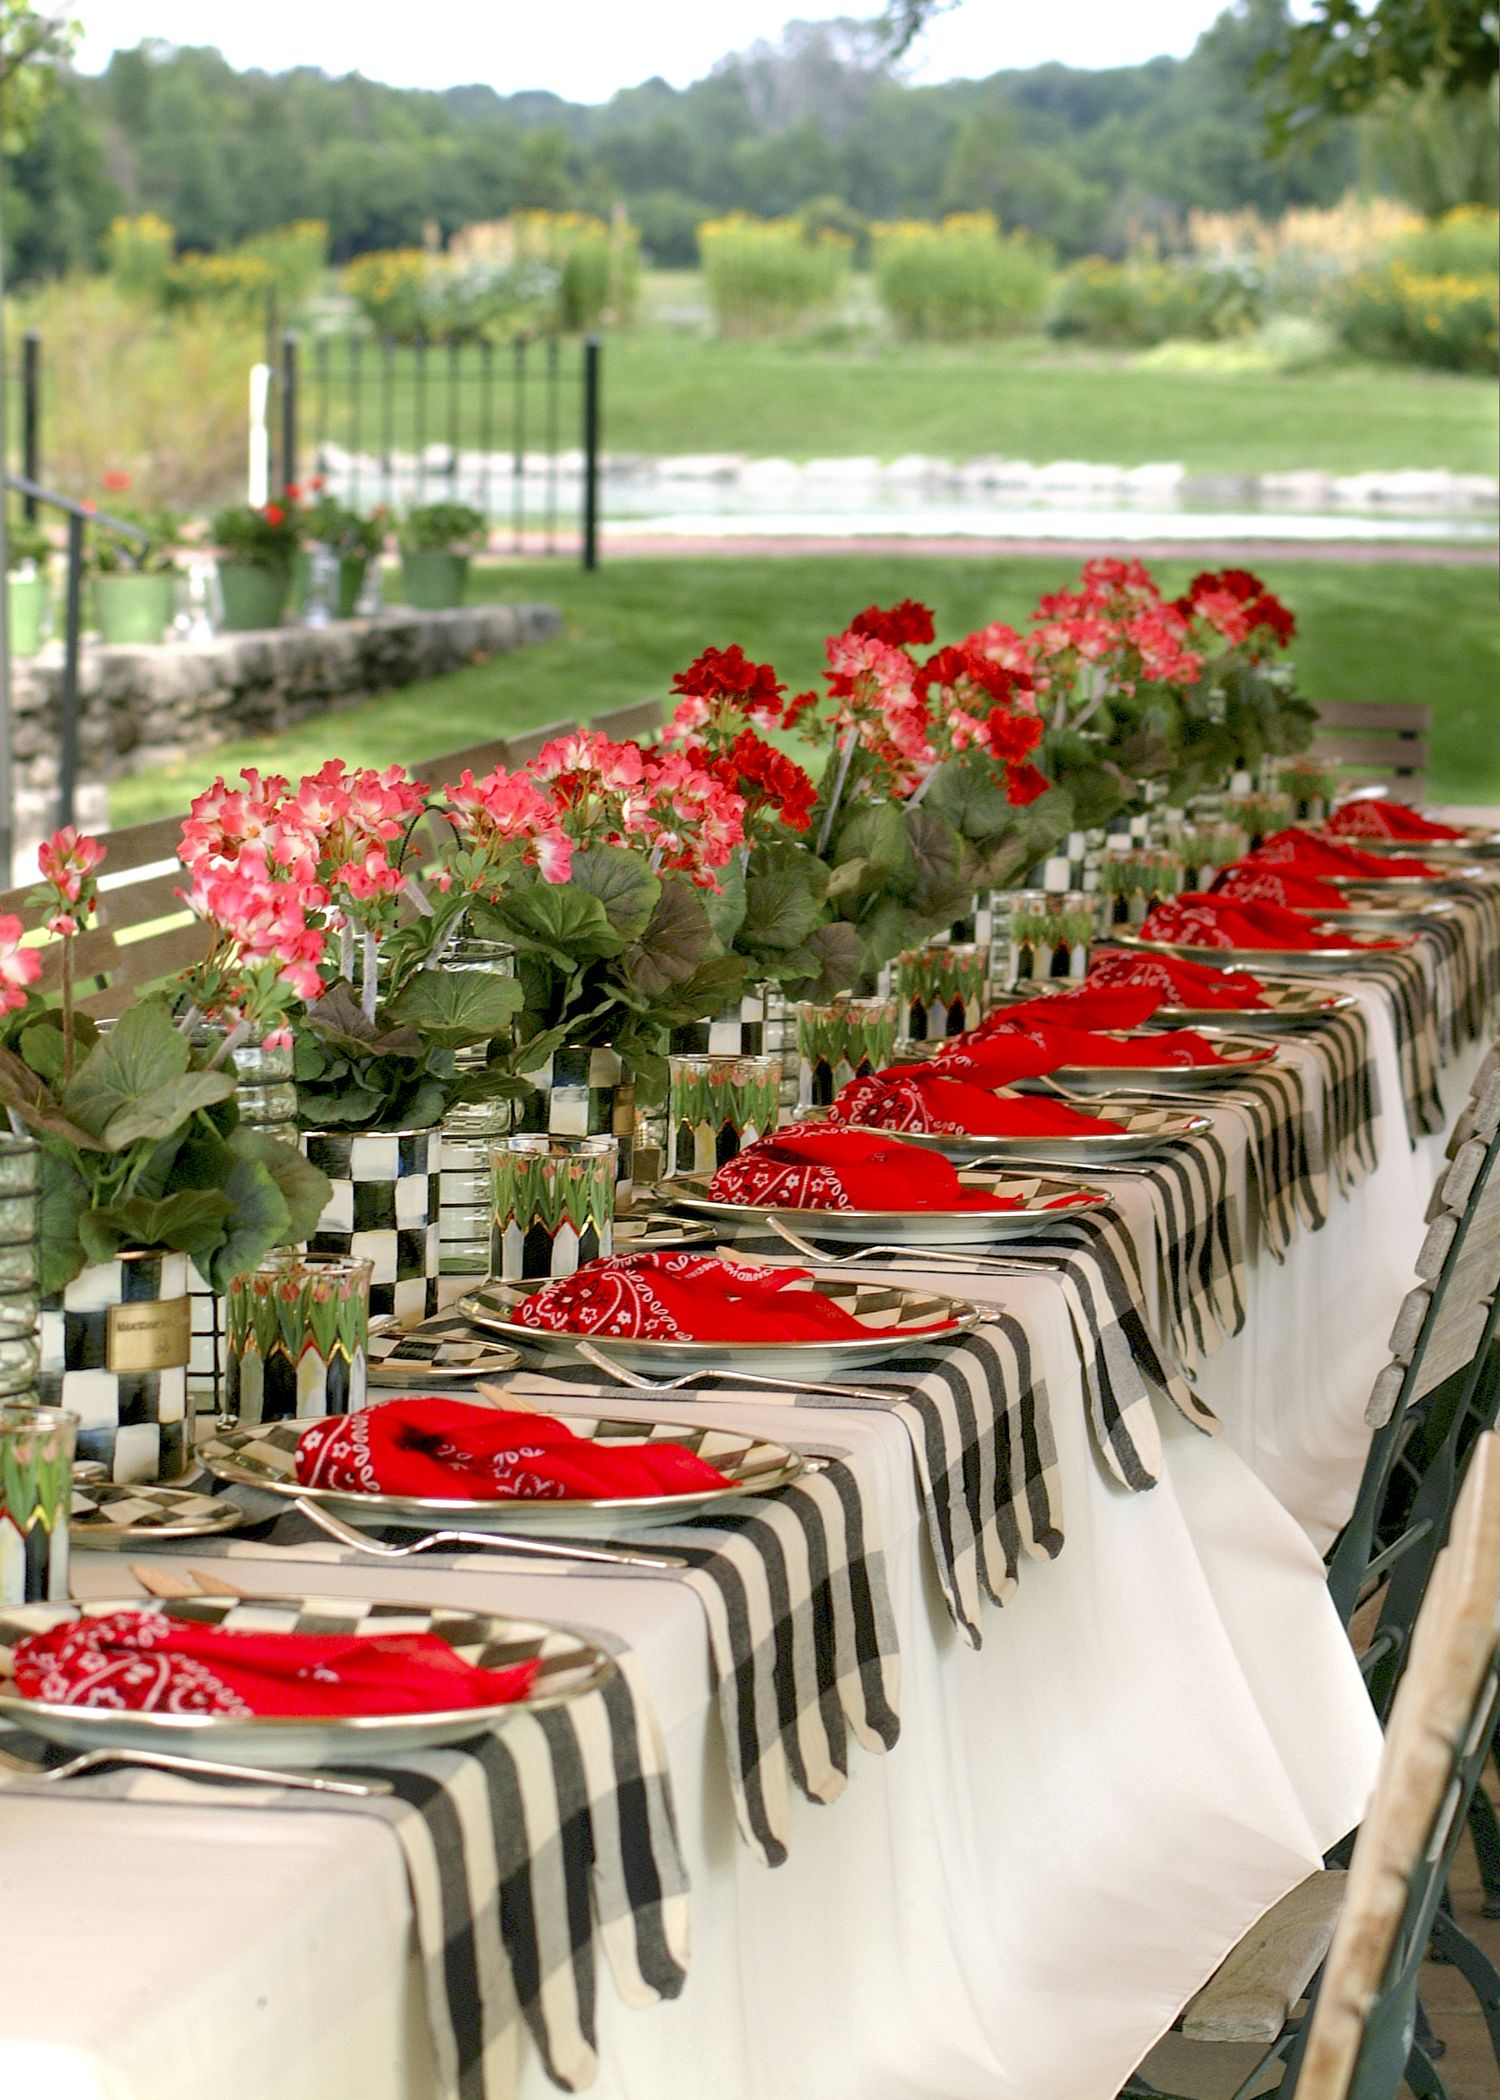 Ideas For Garden Party Themes Gardens Tables And Checker